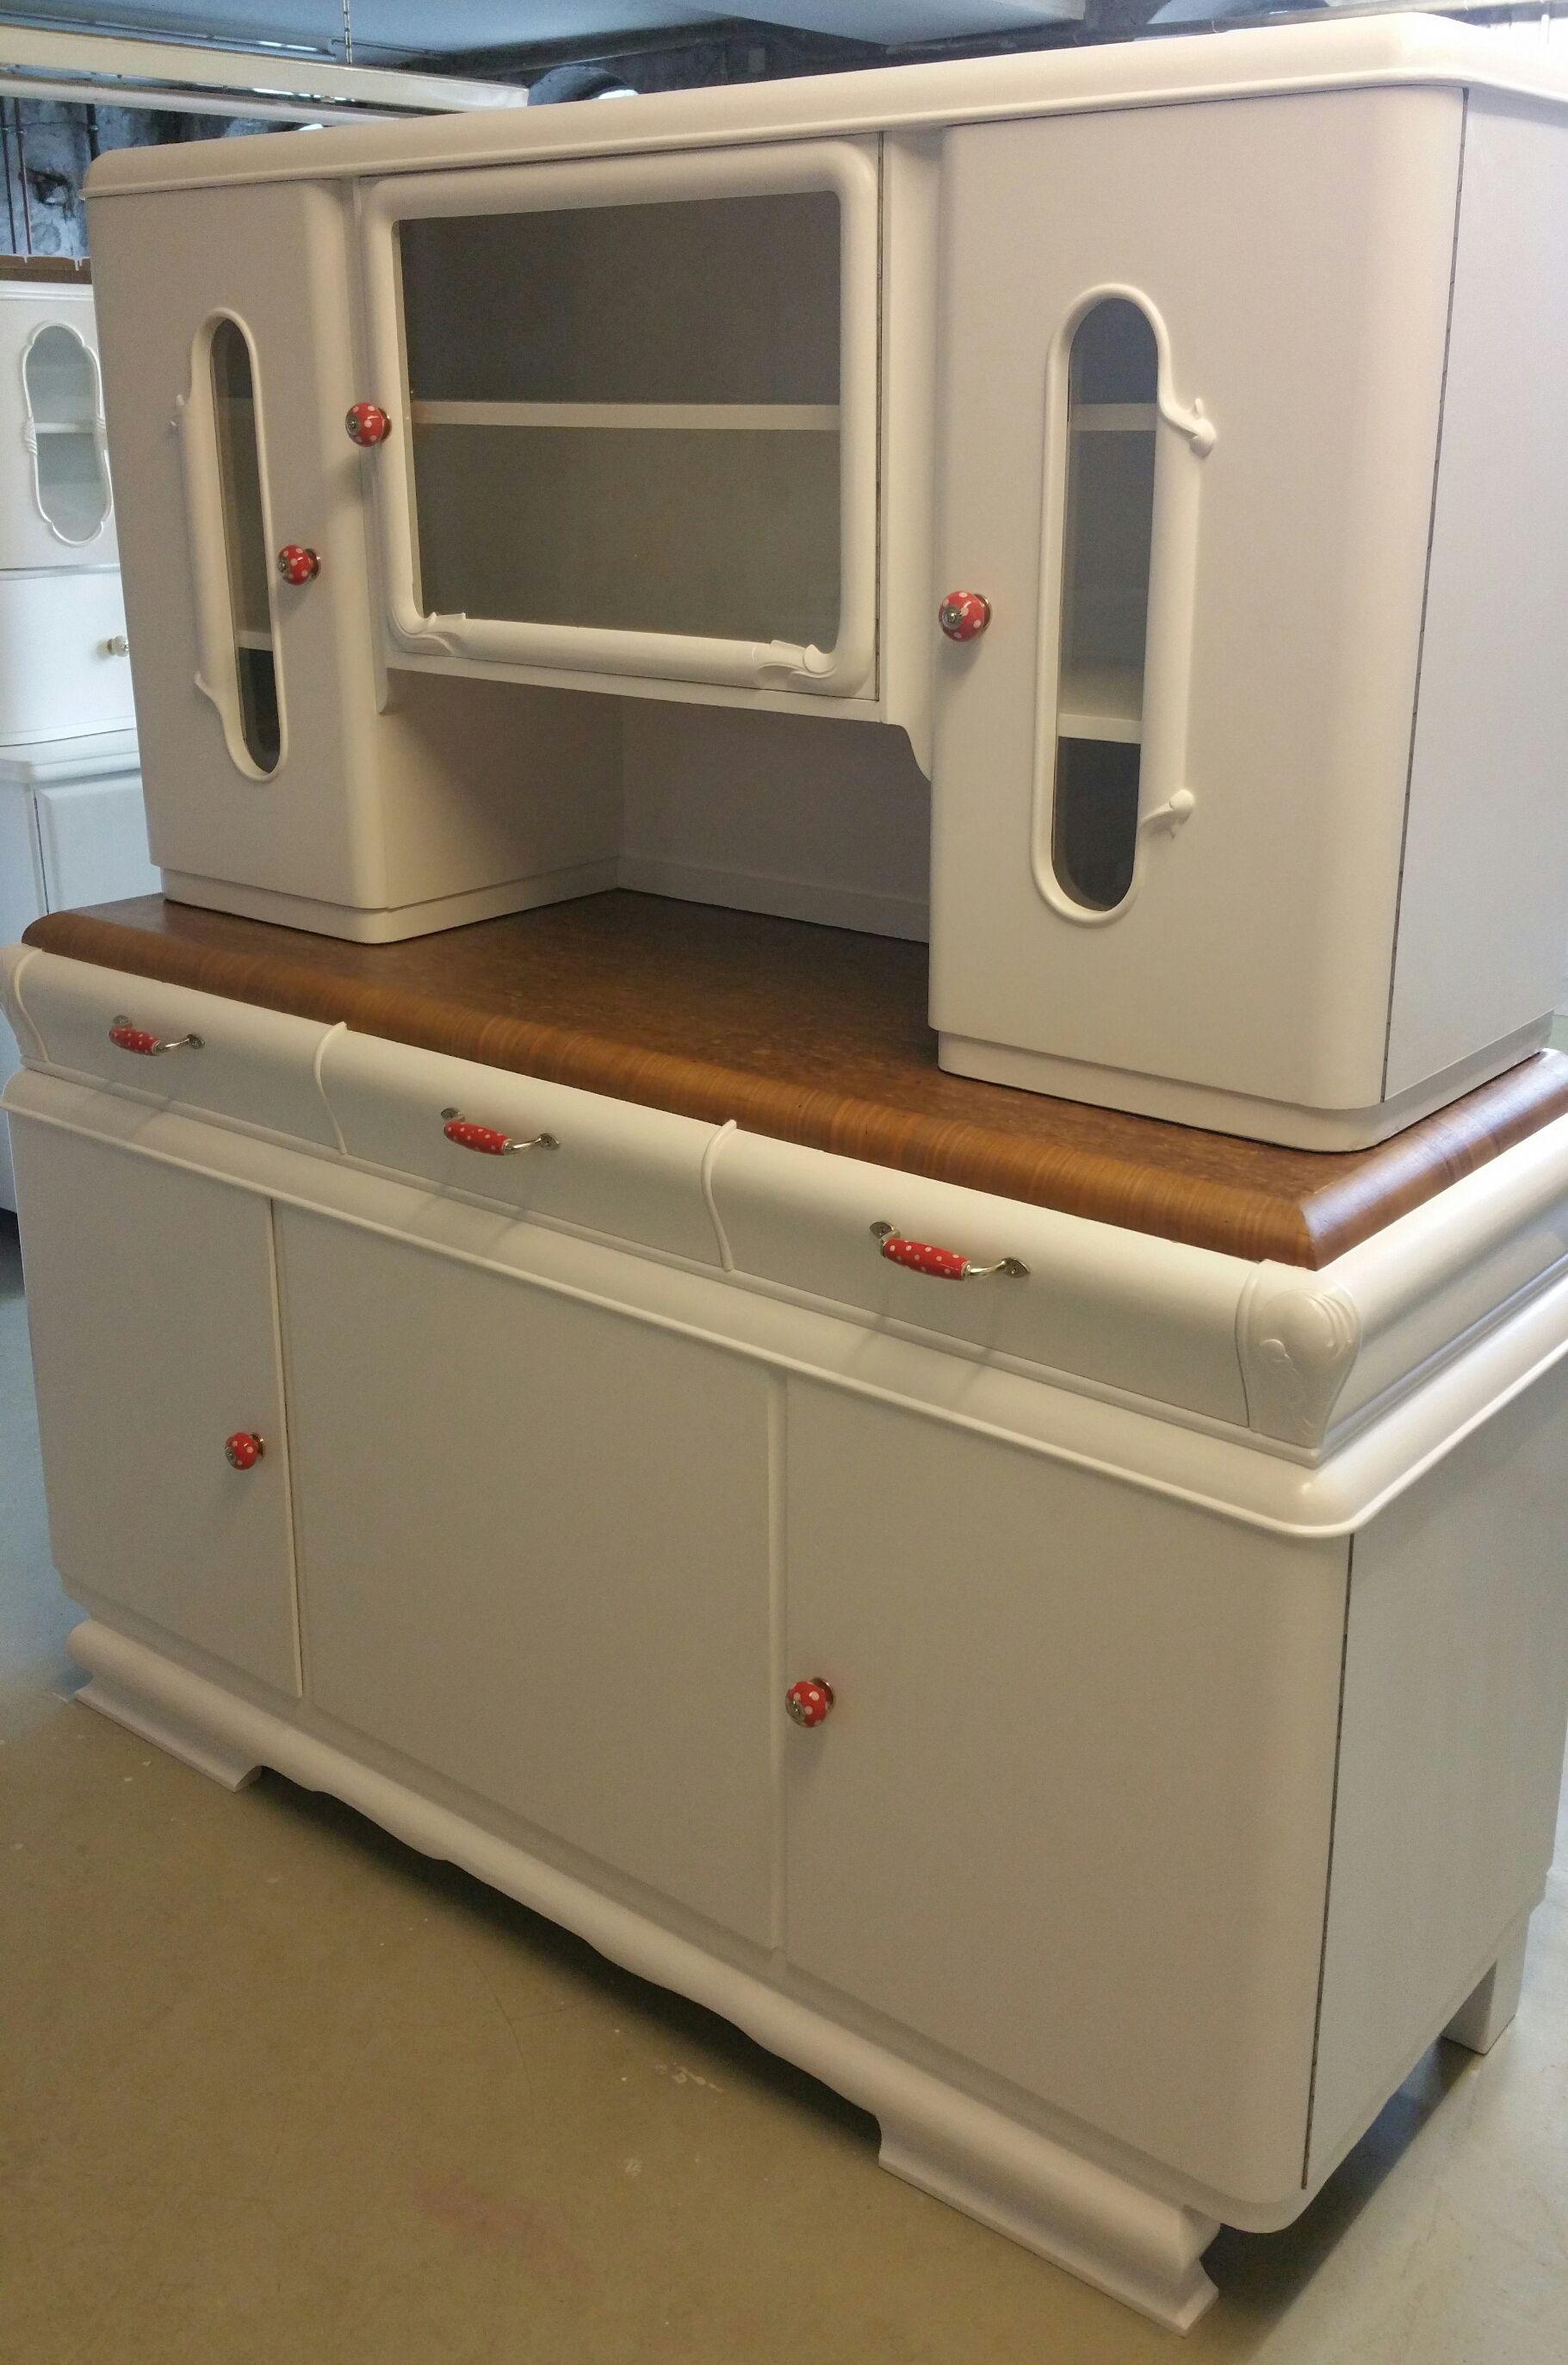 Küchenbuffet 50er Jahre - https://www.garagenmoebel.com/rohling/4675 ...